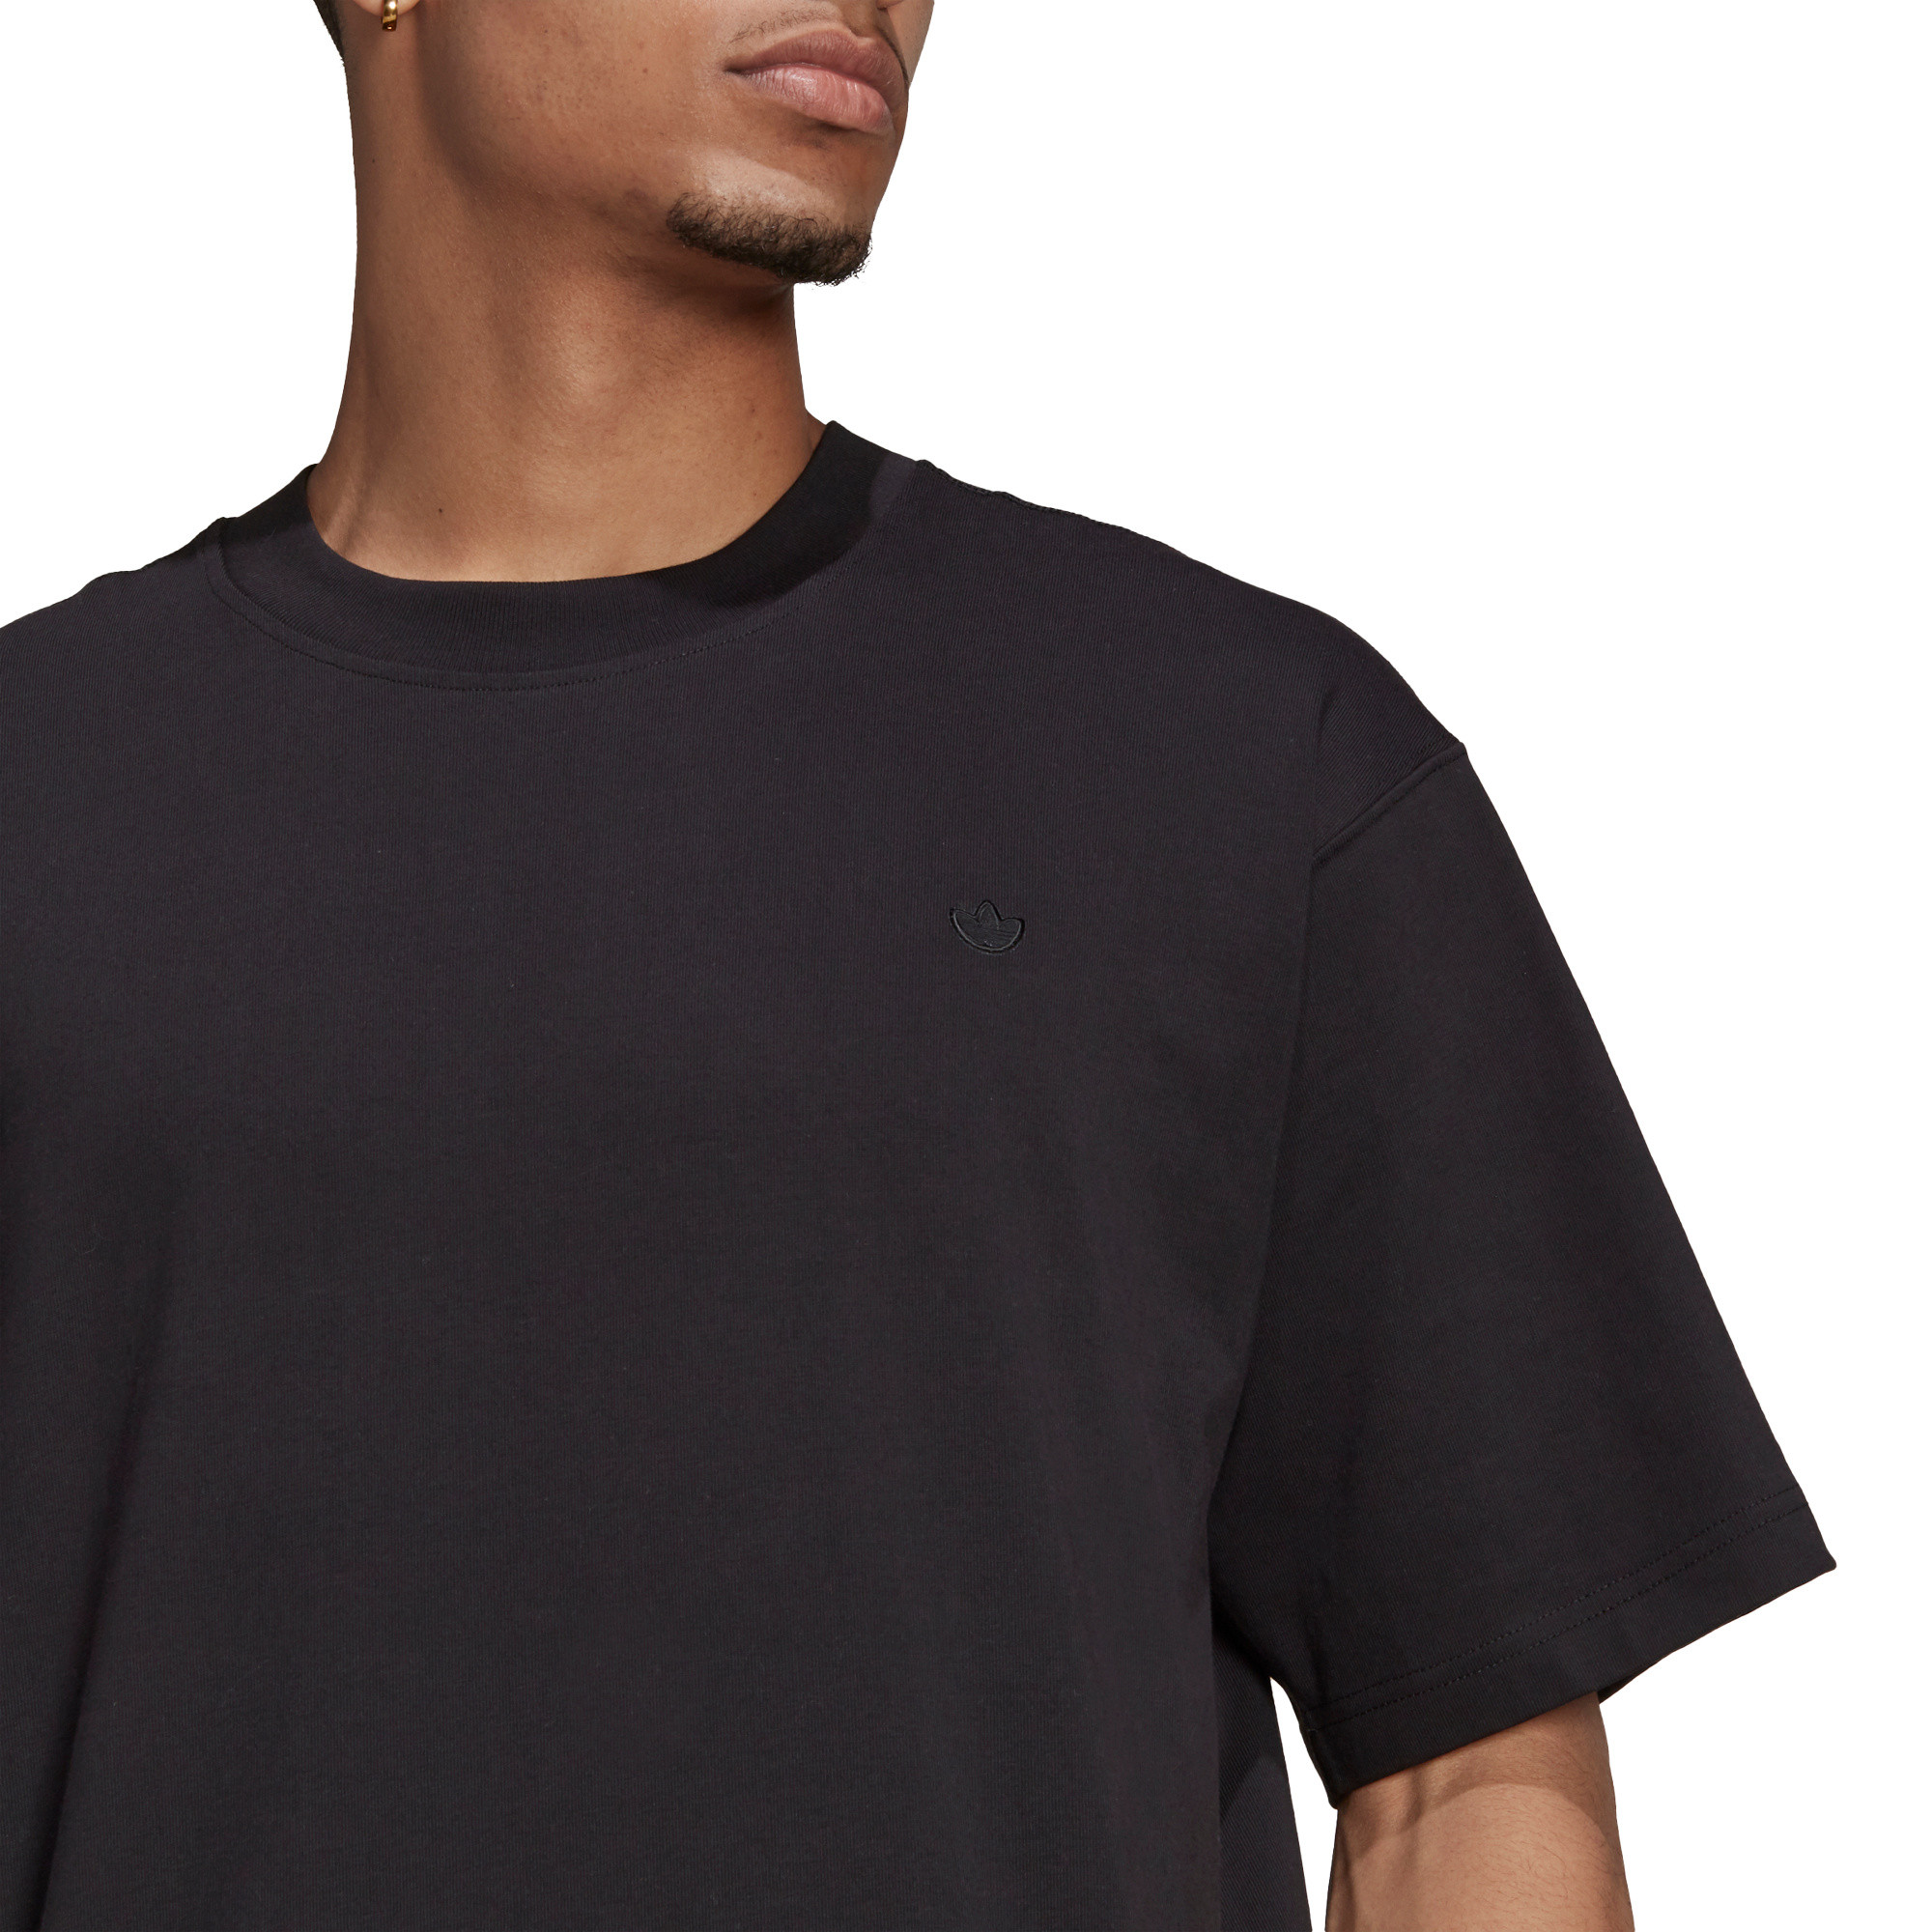 T-shirt uomo adicolor Trefoil, Nero, large image number 5